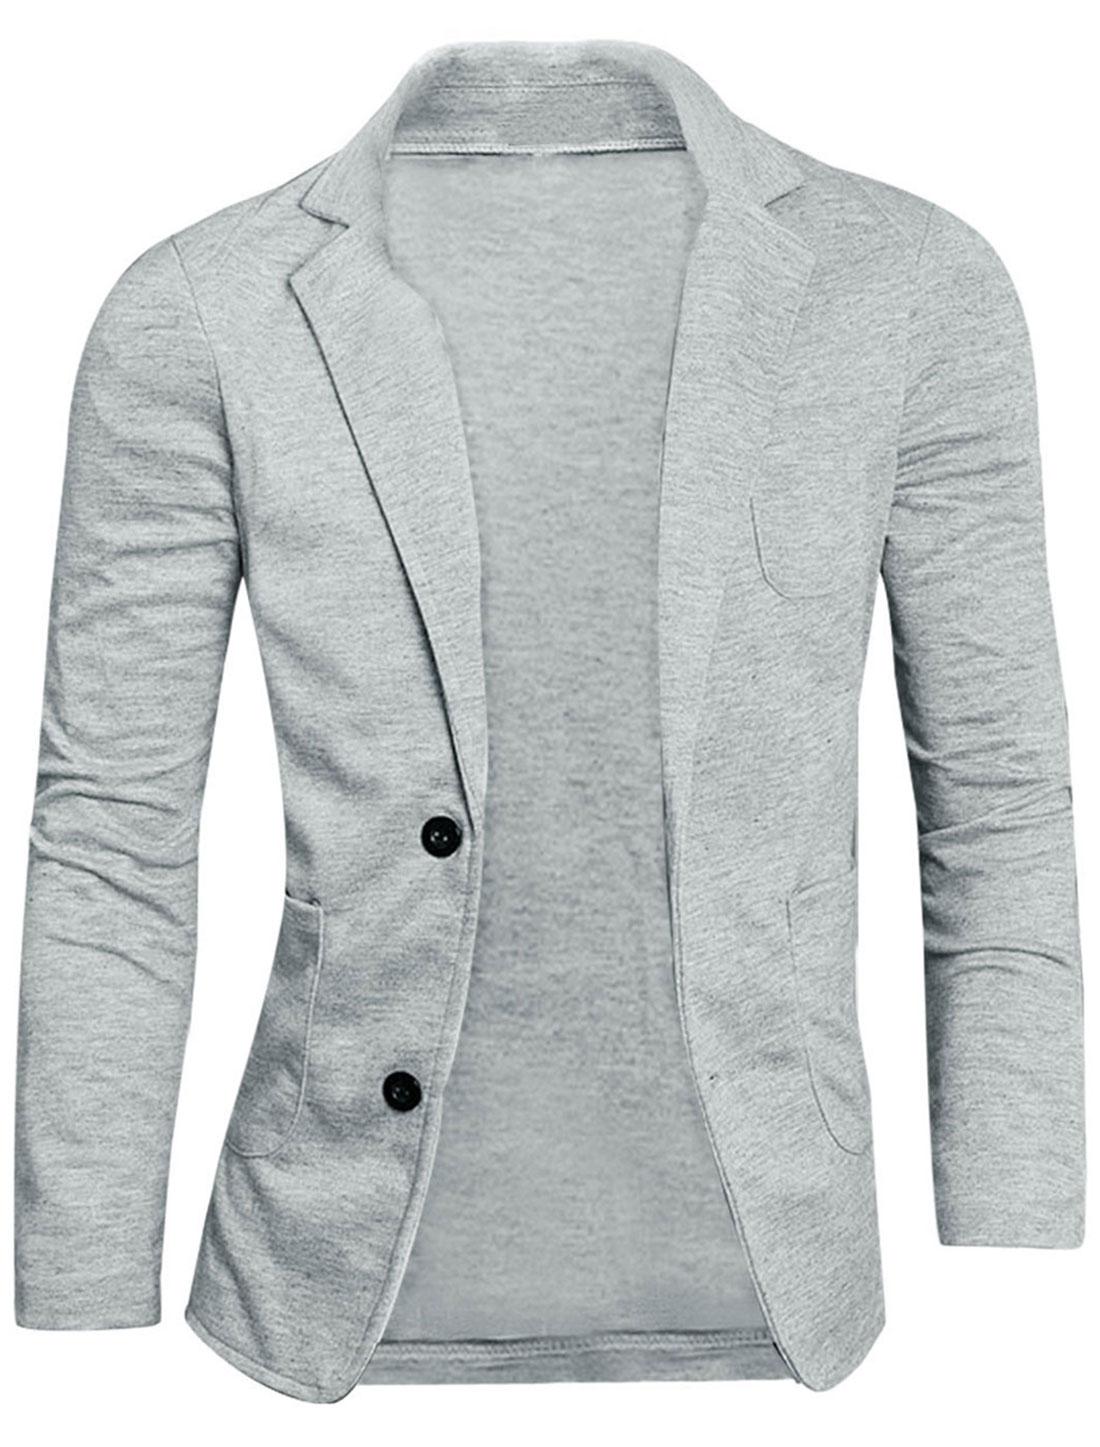 Mens Gray Stylish Solid Color Small Pocket Upper Button Closure Fall Blazer M